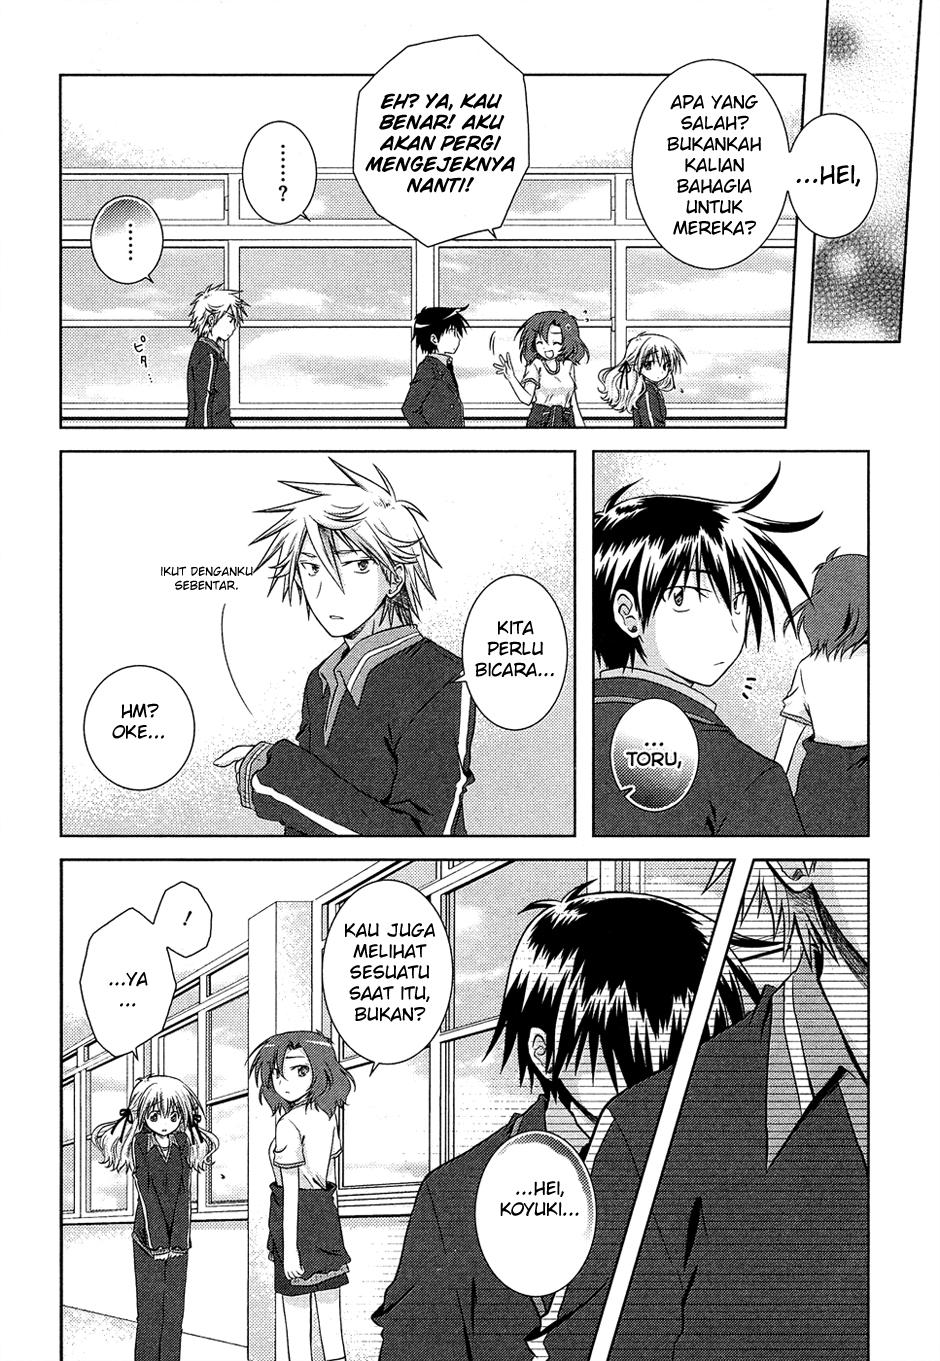 Komik iris zero 0010 11 Indonesia iris zero 0010 Terbaru 10|Baca Manga Komik Indonesia|